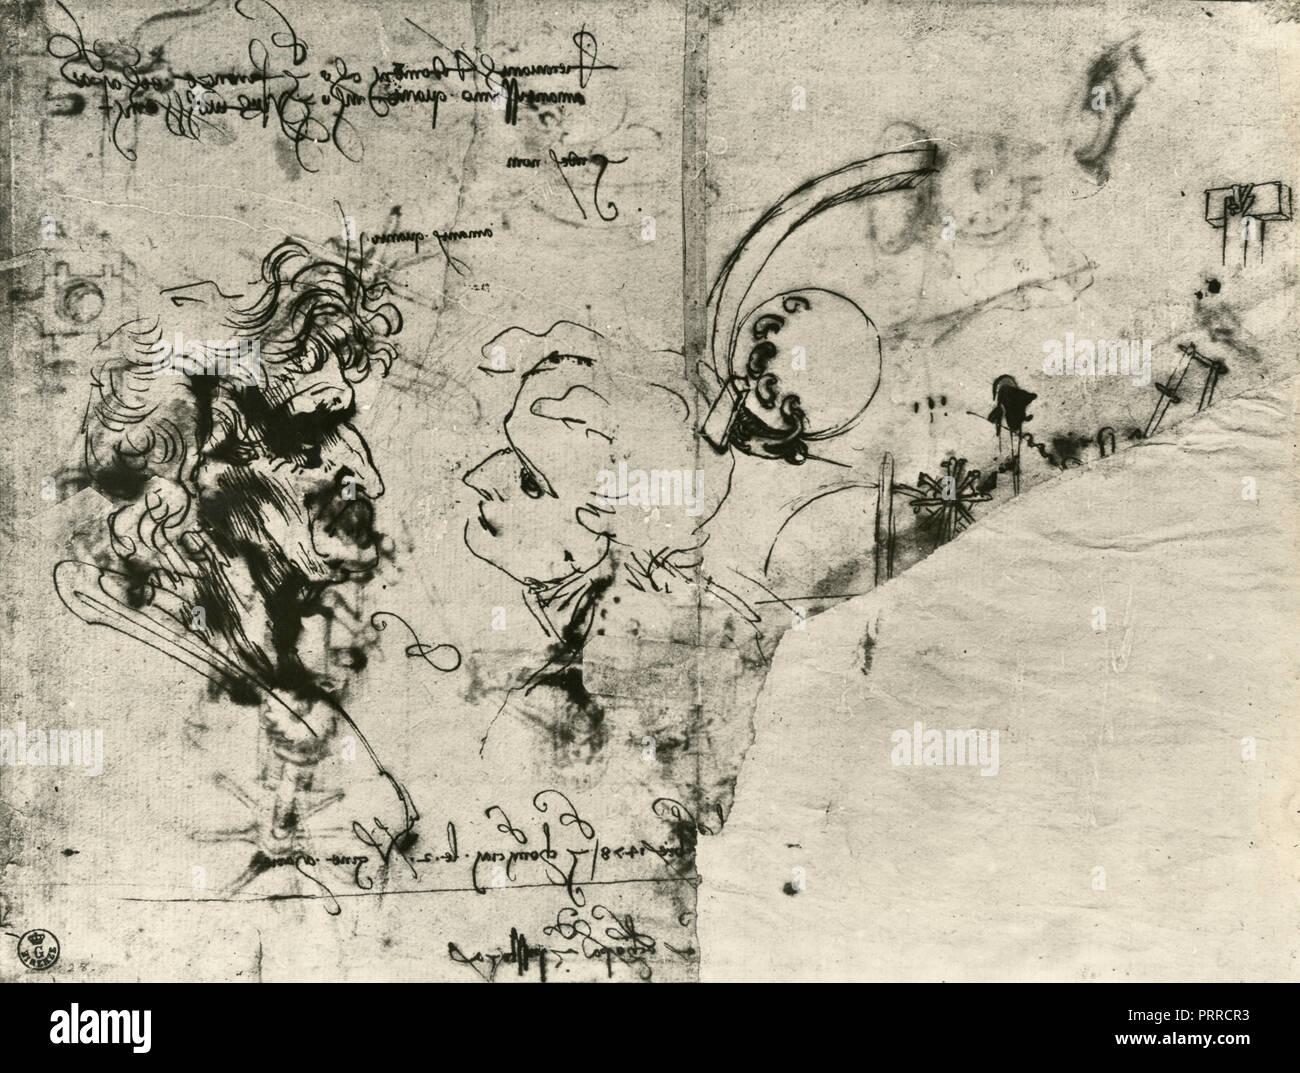 Kopf Studien, Zeichnung von Leonardo da Vinci, 1920 s Stockbild